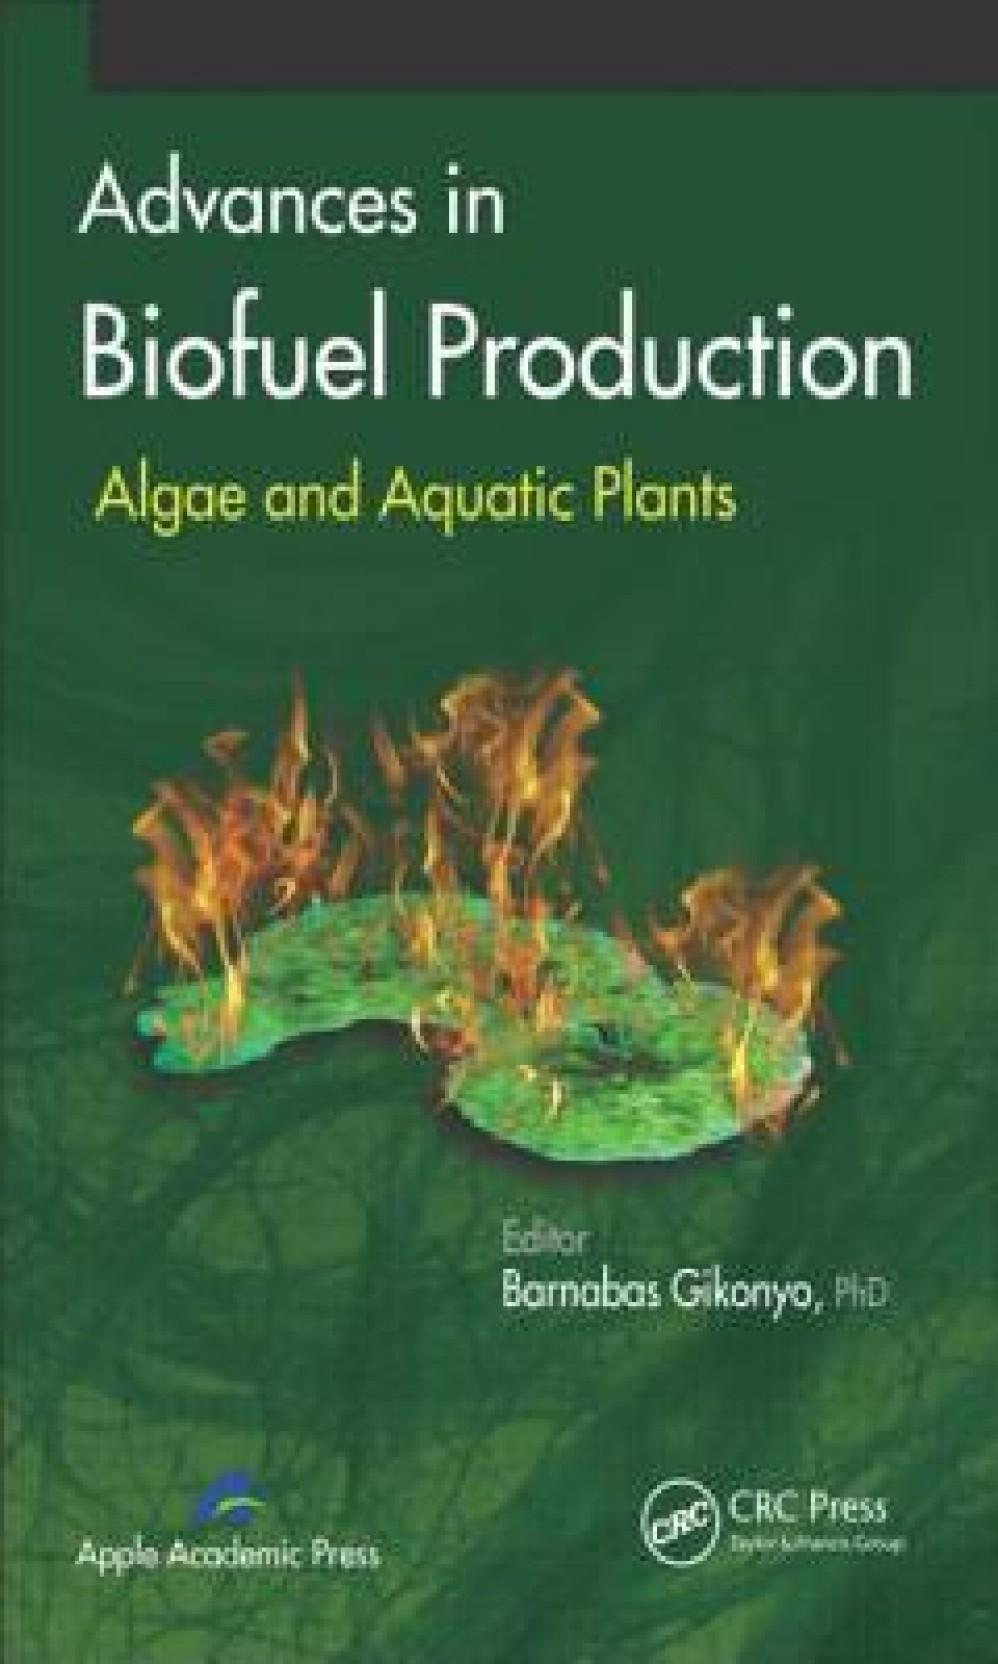 Advances in Biofuel Production: Algae and Aquatic Plants. ADD TO CART